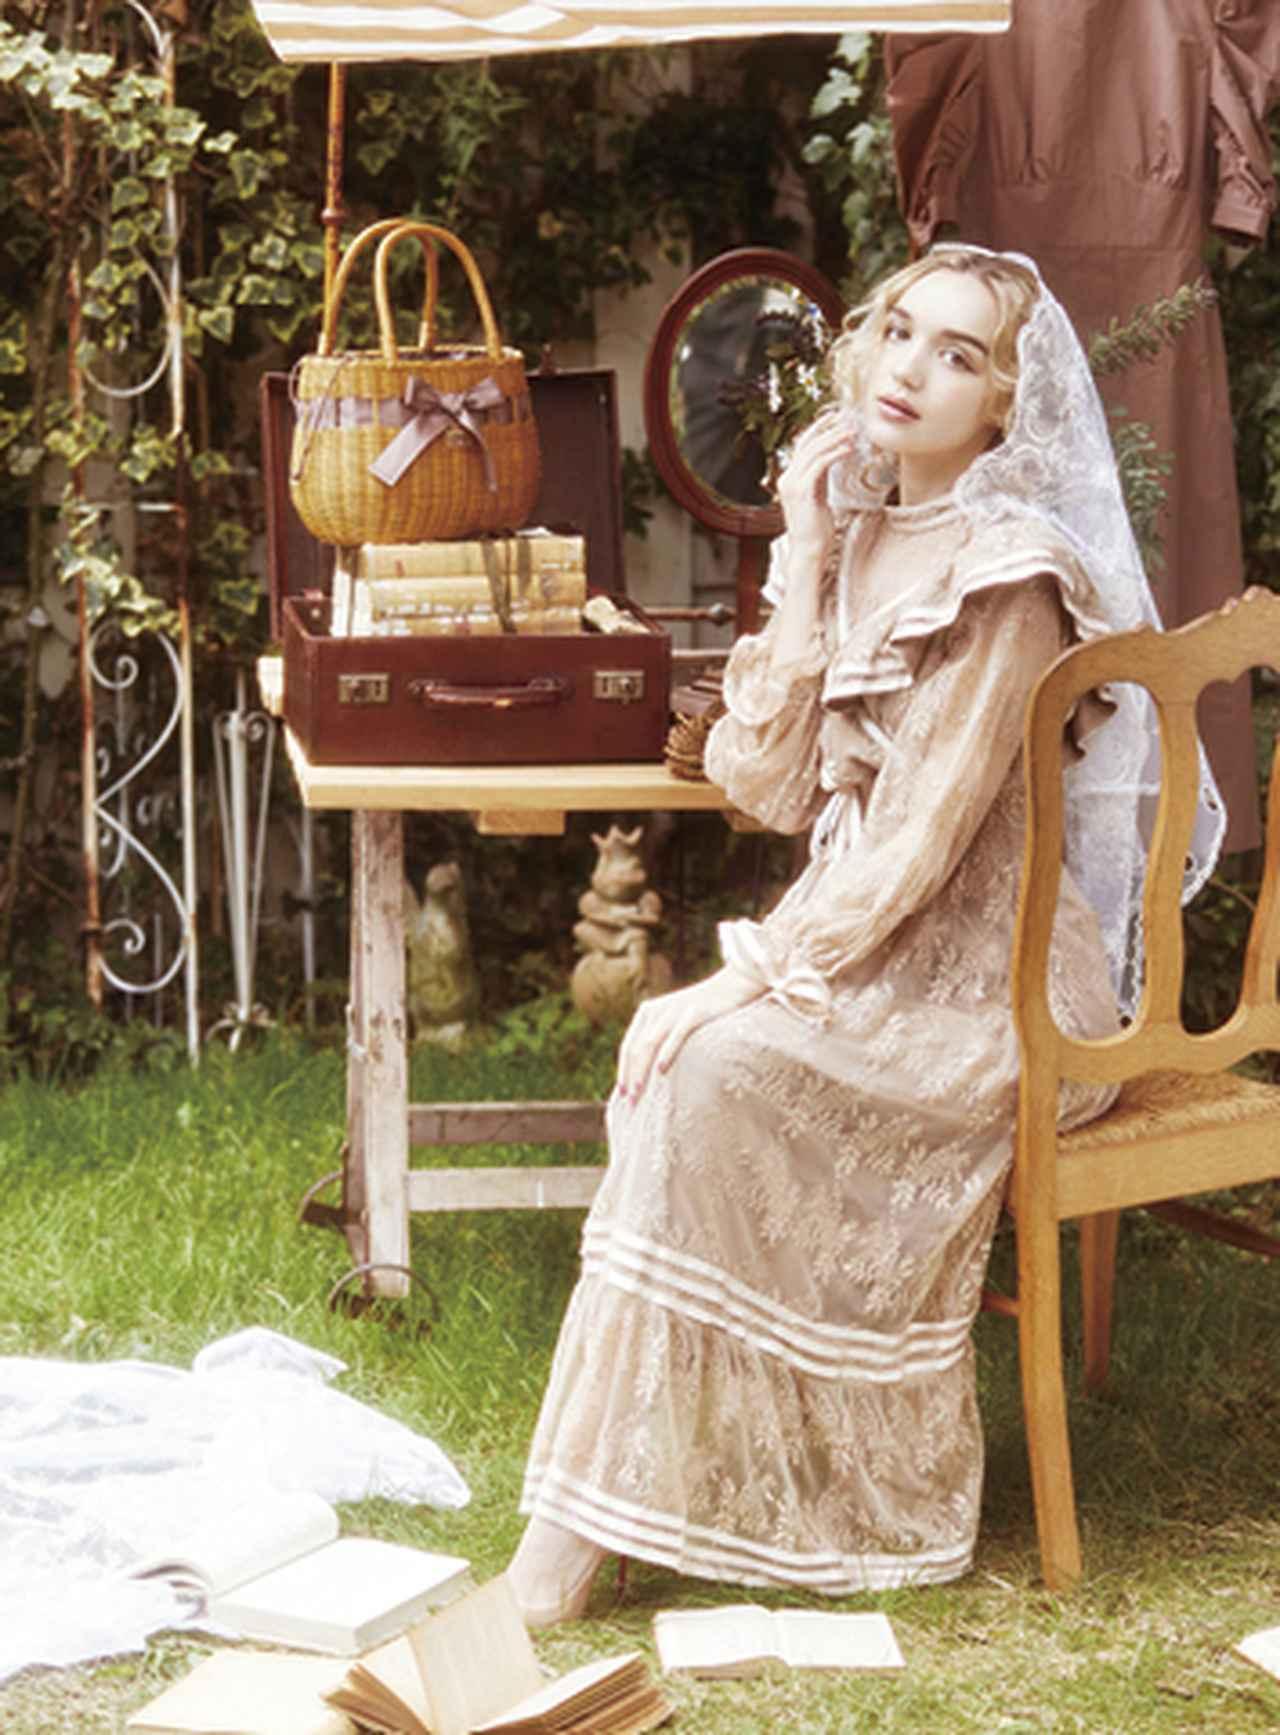 画像: Maison de FLEUR Petite Robe